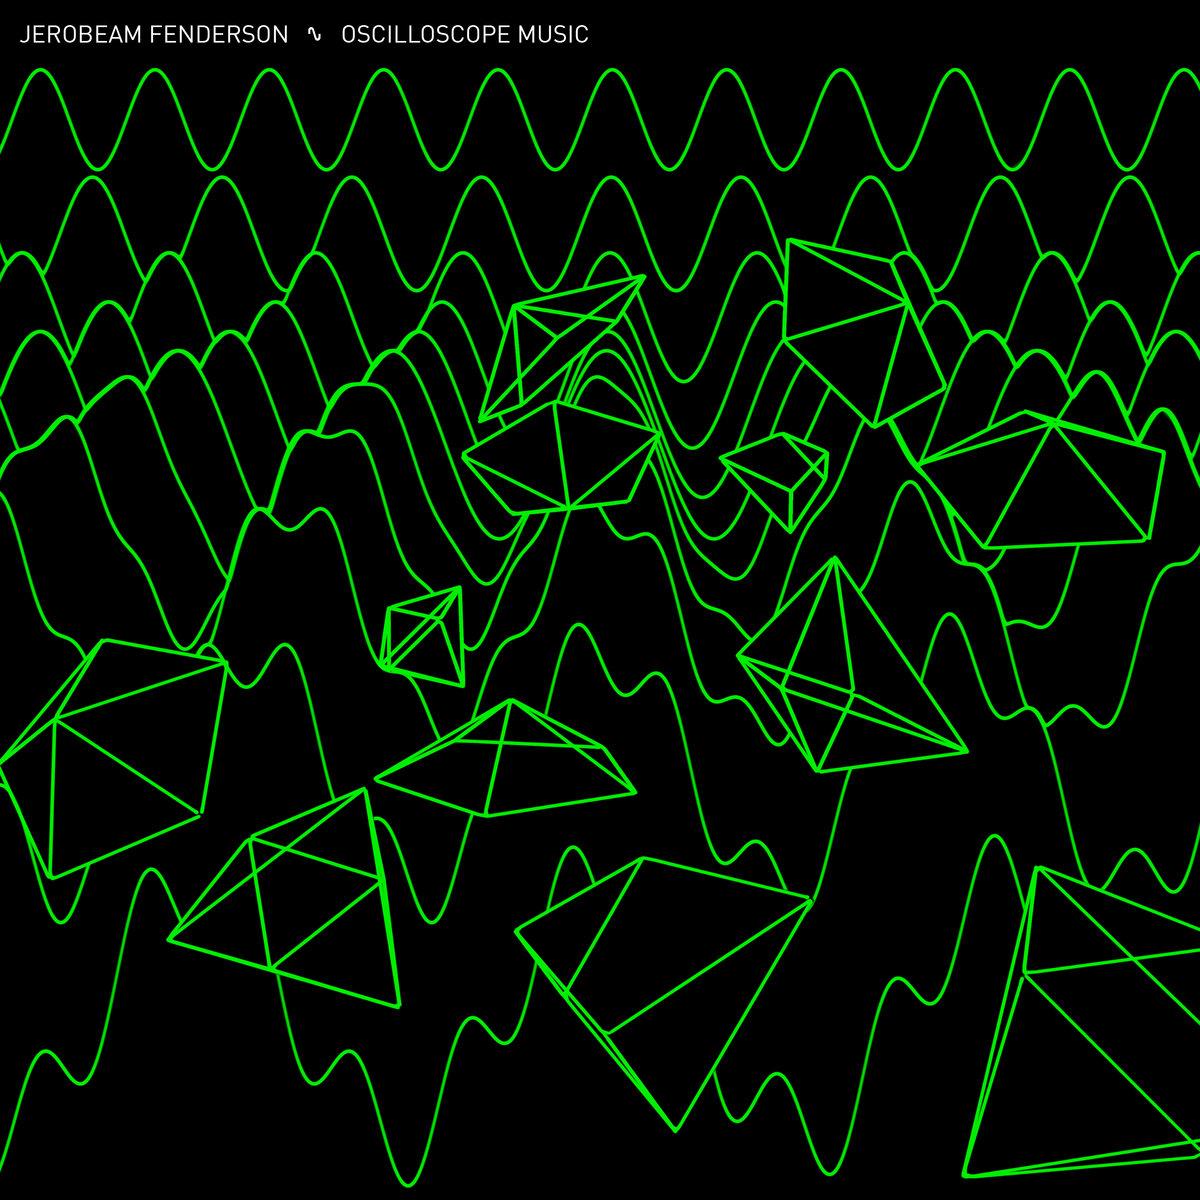 Oscilloscope Music | Jerobeam Fenderson